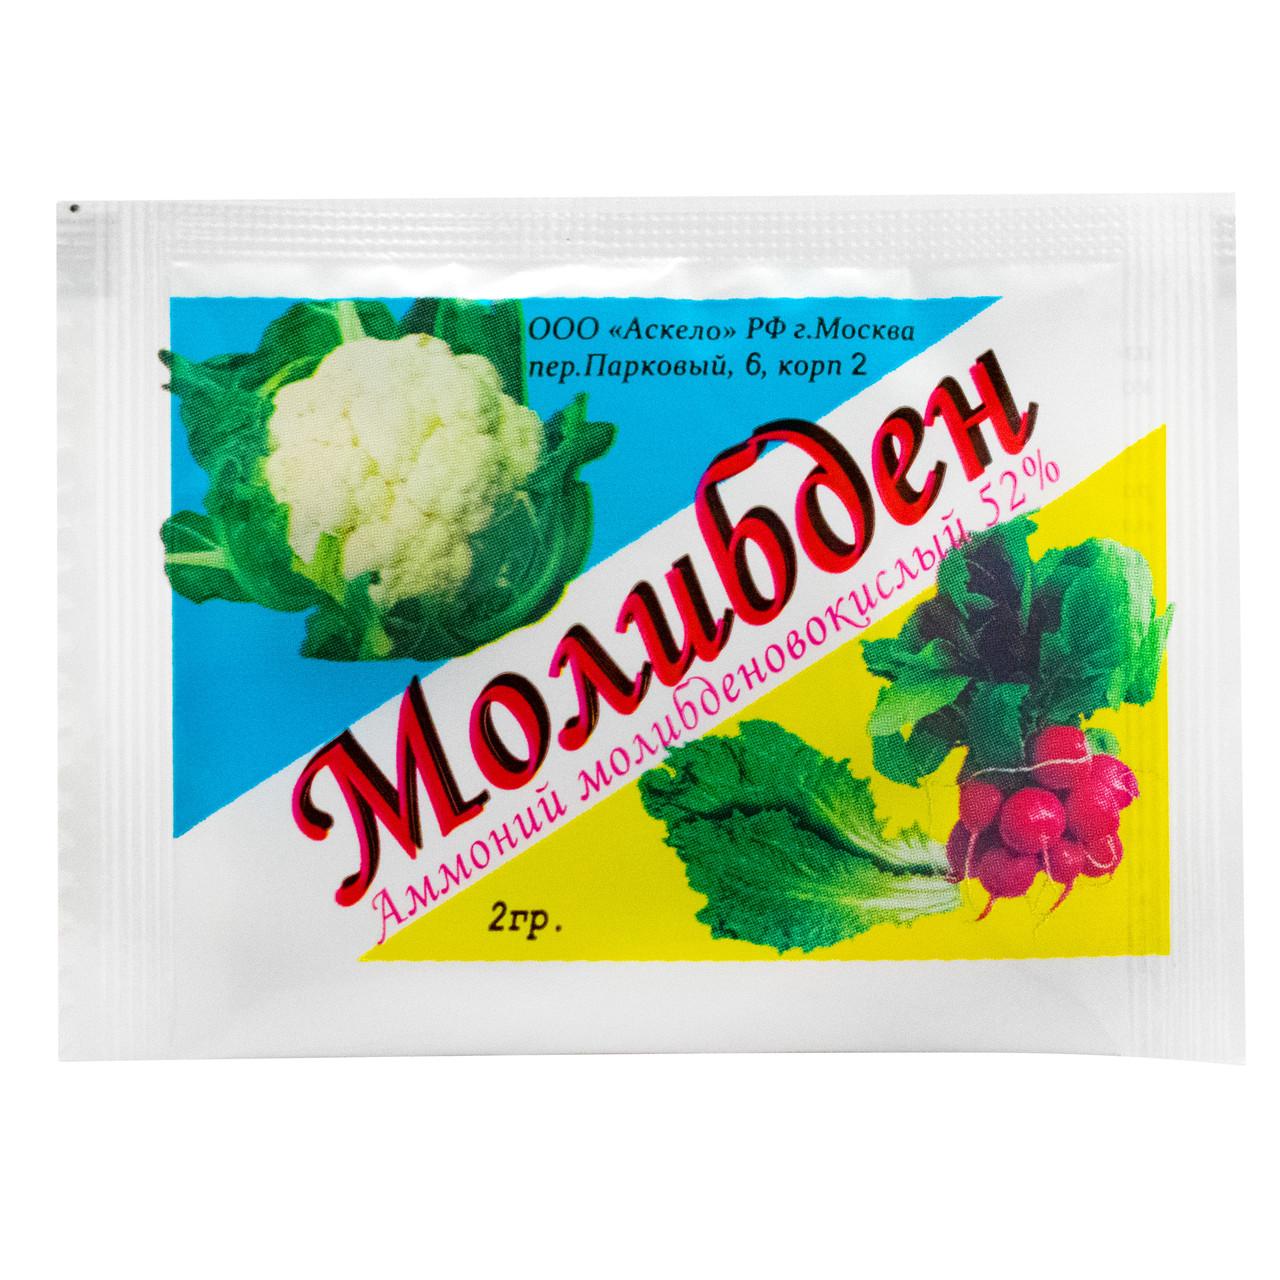 Удобрение Молибден 52% 2 г